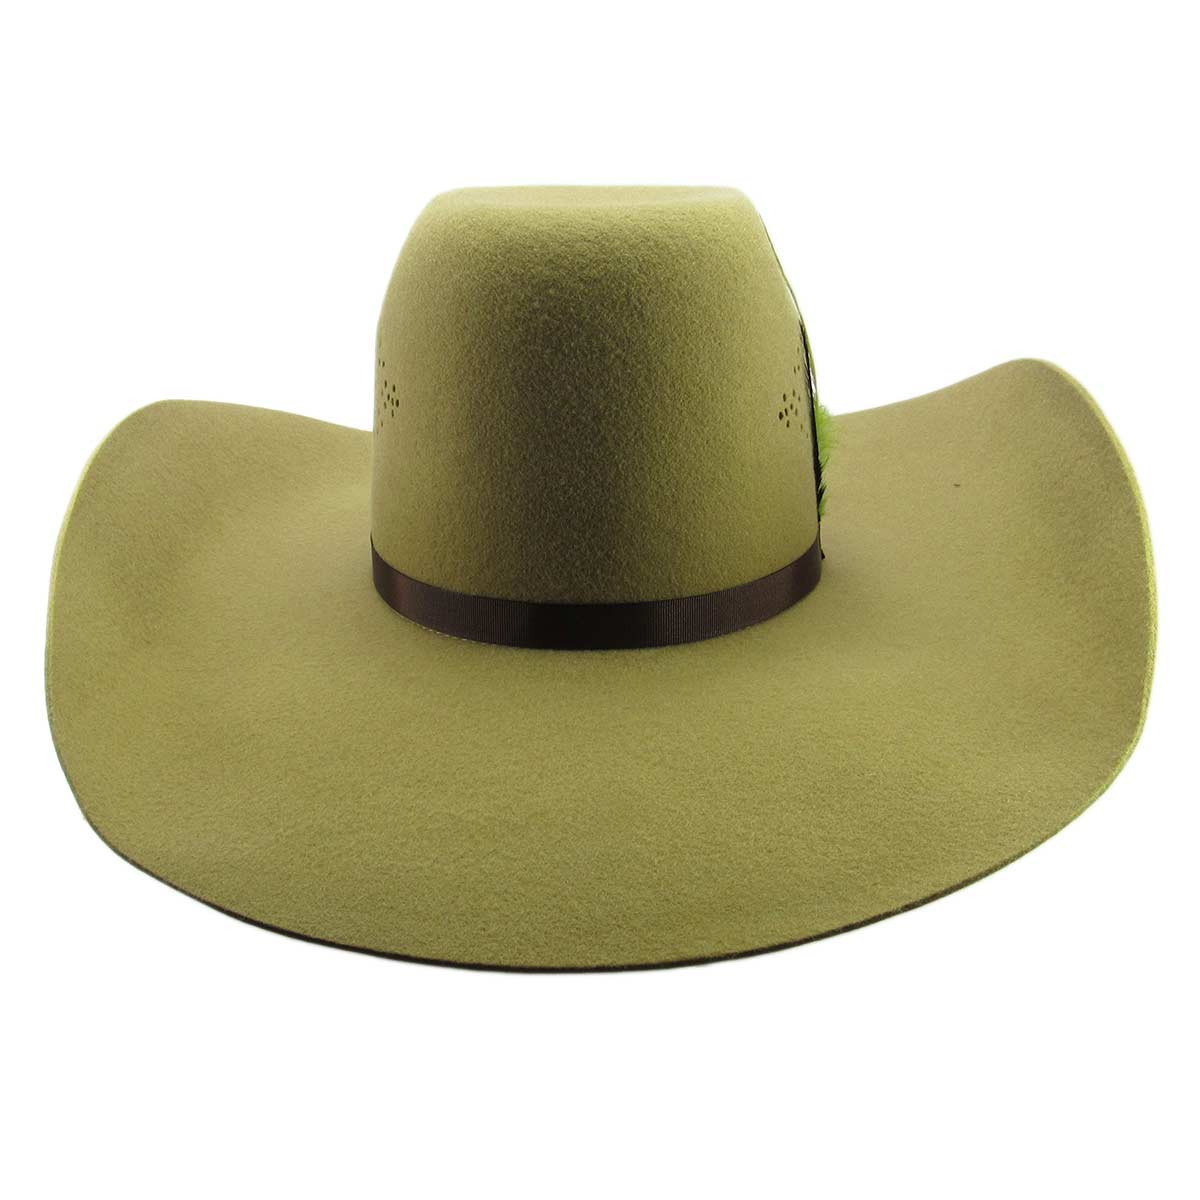 Chapéu Country Pralana Feltro Rendado Camel Aba 13 - Cowboy BR 1a598fb682f